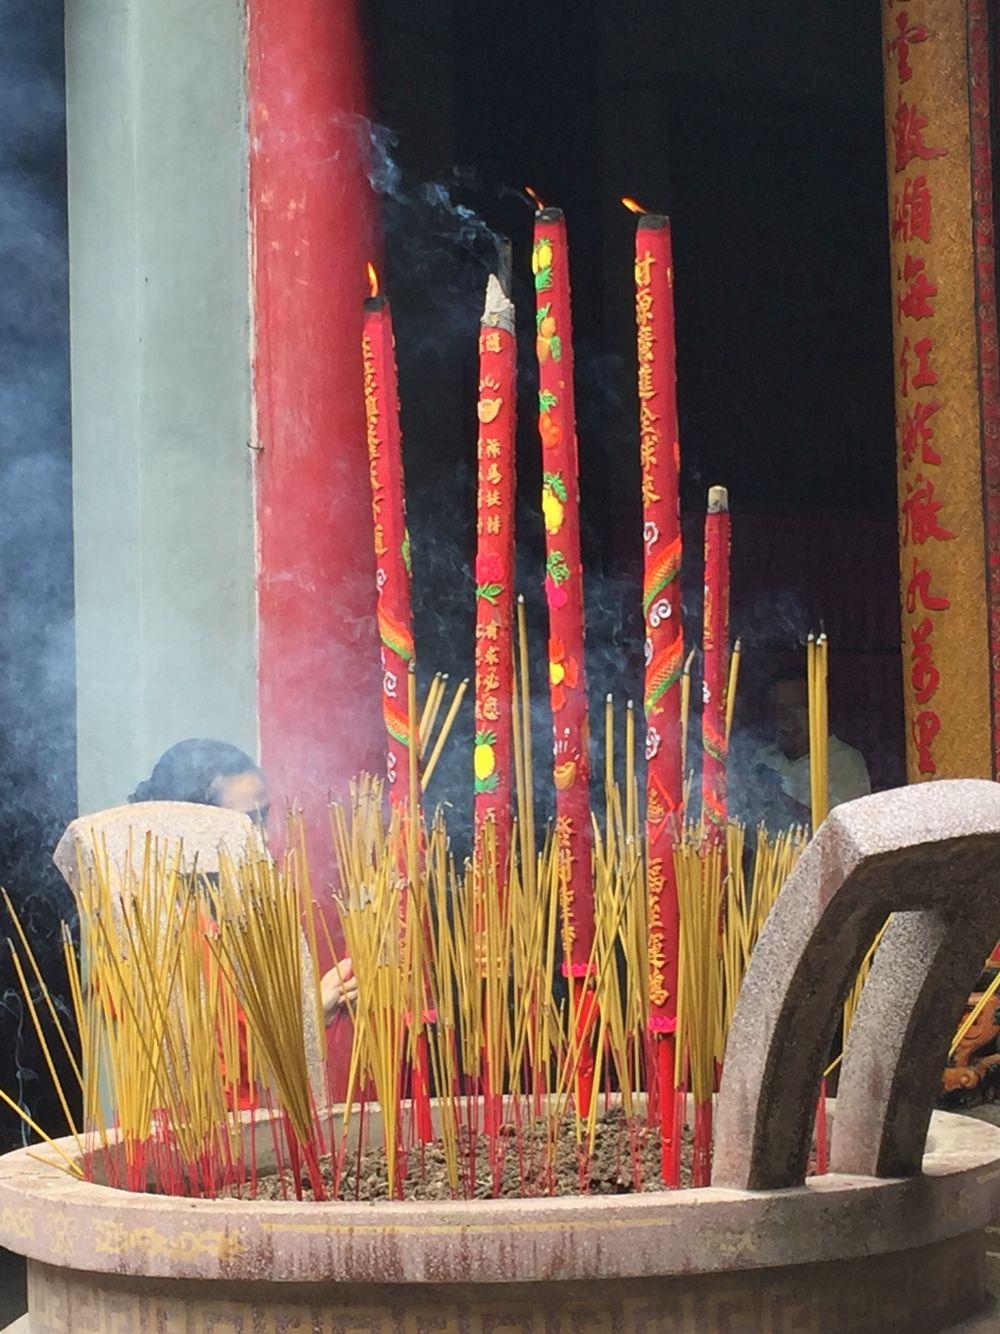 Burn joss sticks burn http://www.angelstarchristy.com/2015/11/a-tribute-to-patron-goddess-of-sea-chua.html?m=1